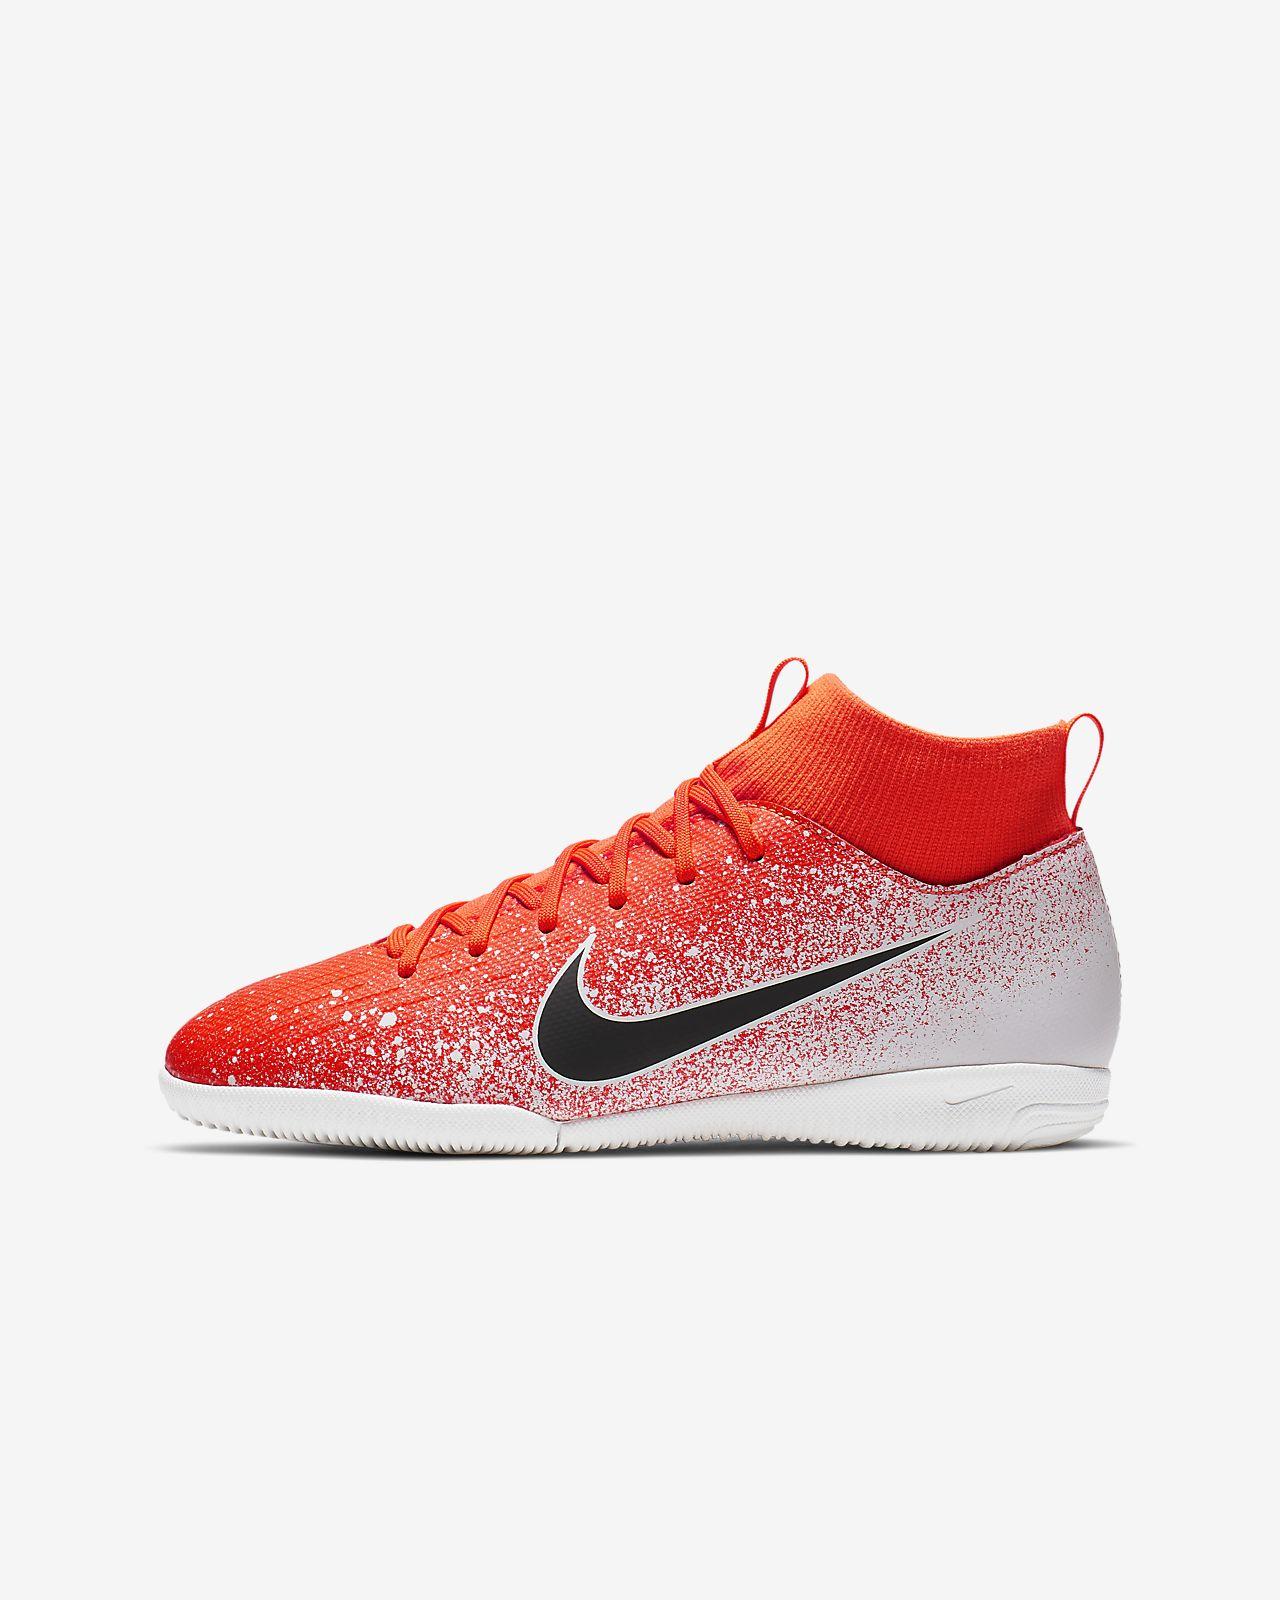 Scarpa da calcio per campo indoor/cemento Nike Jr. SuperflyX 6 Academy IC - Bambini/Ragazzi